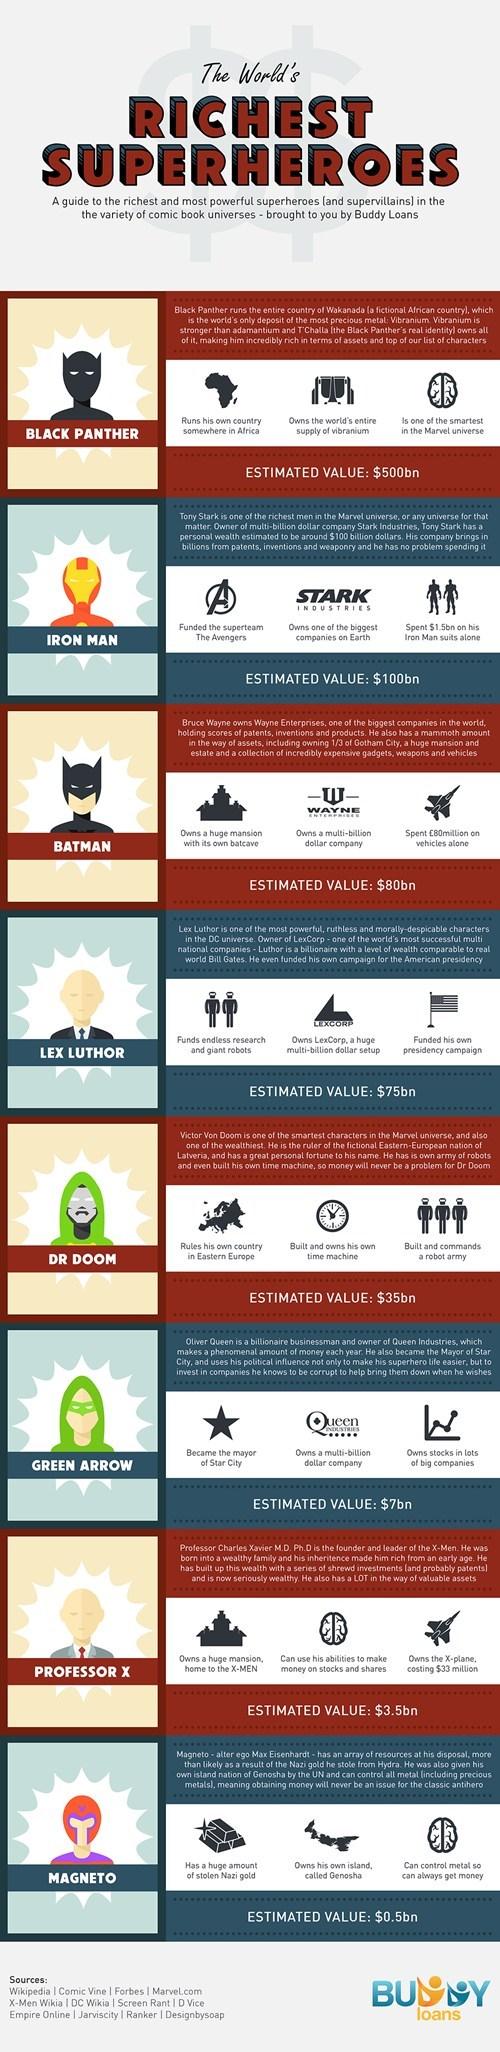 infographics superheroes rich - 8183823360